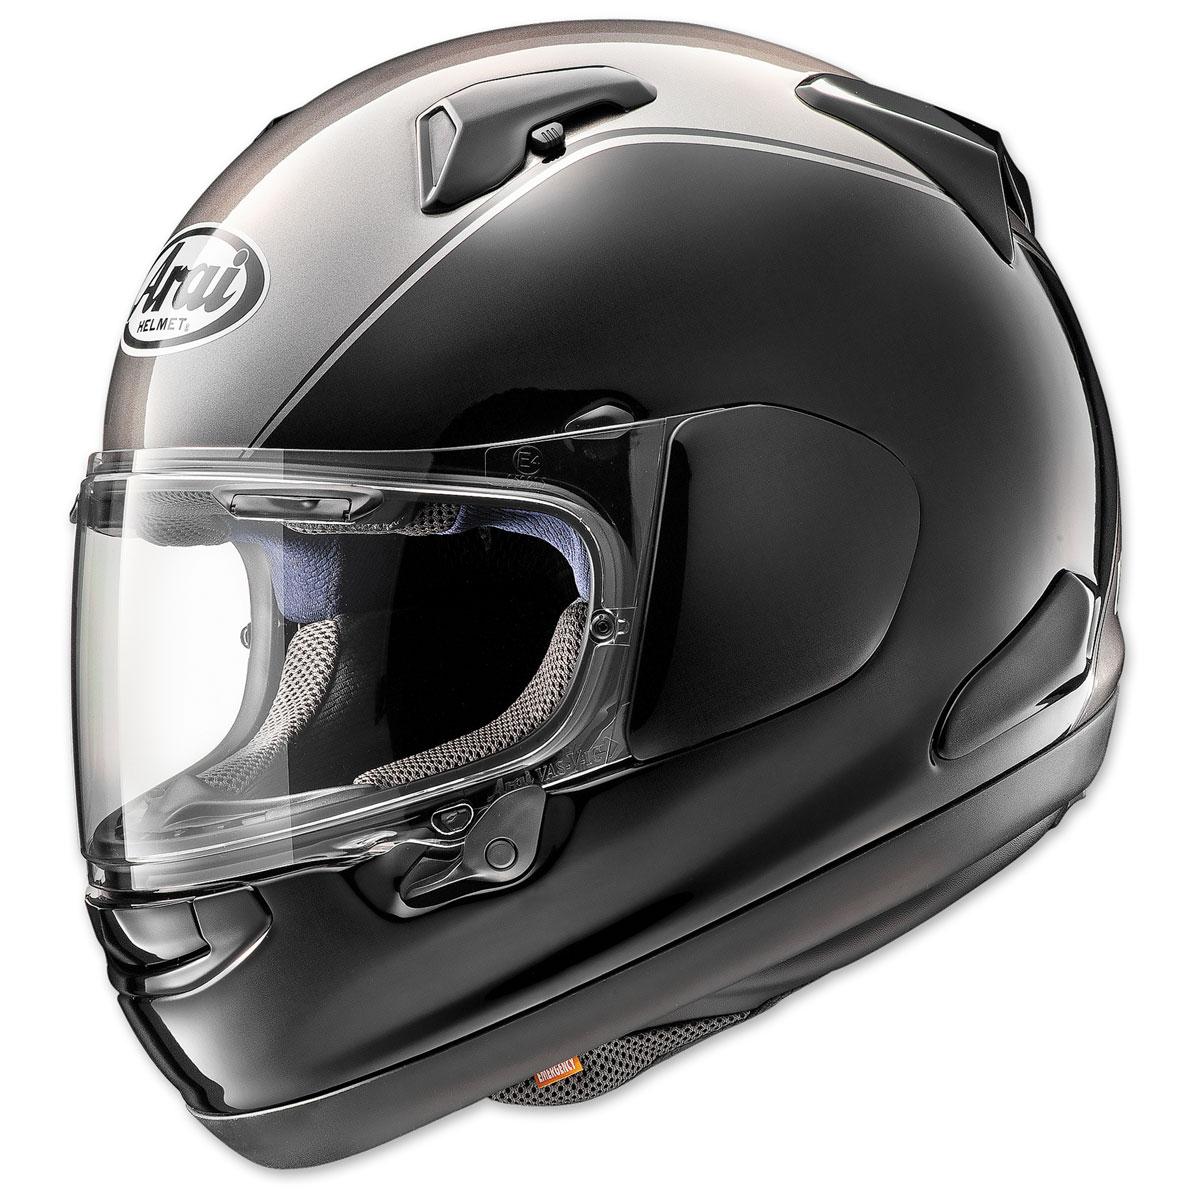 Arai Signet-X Gold Wing Gray/Black Full Face Helmet